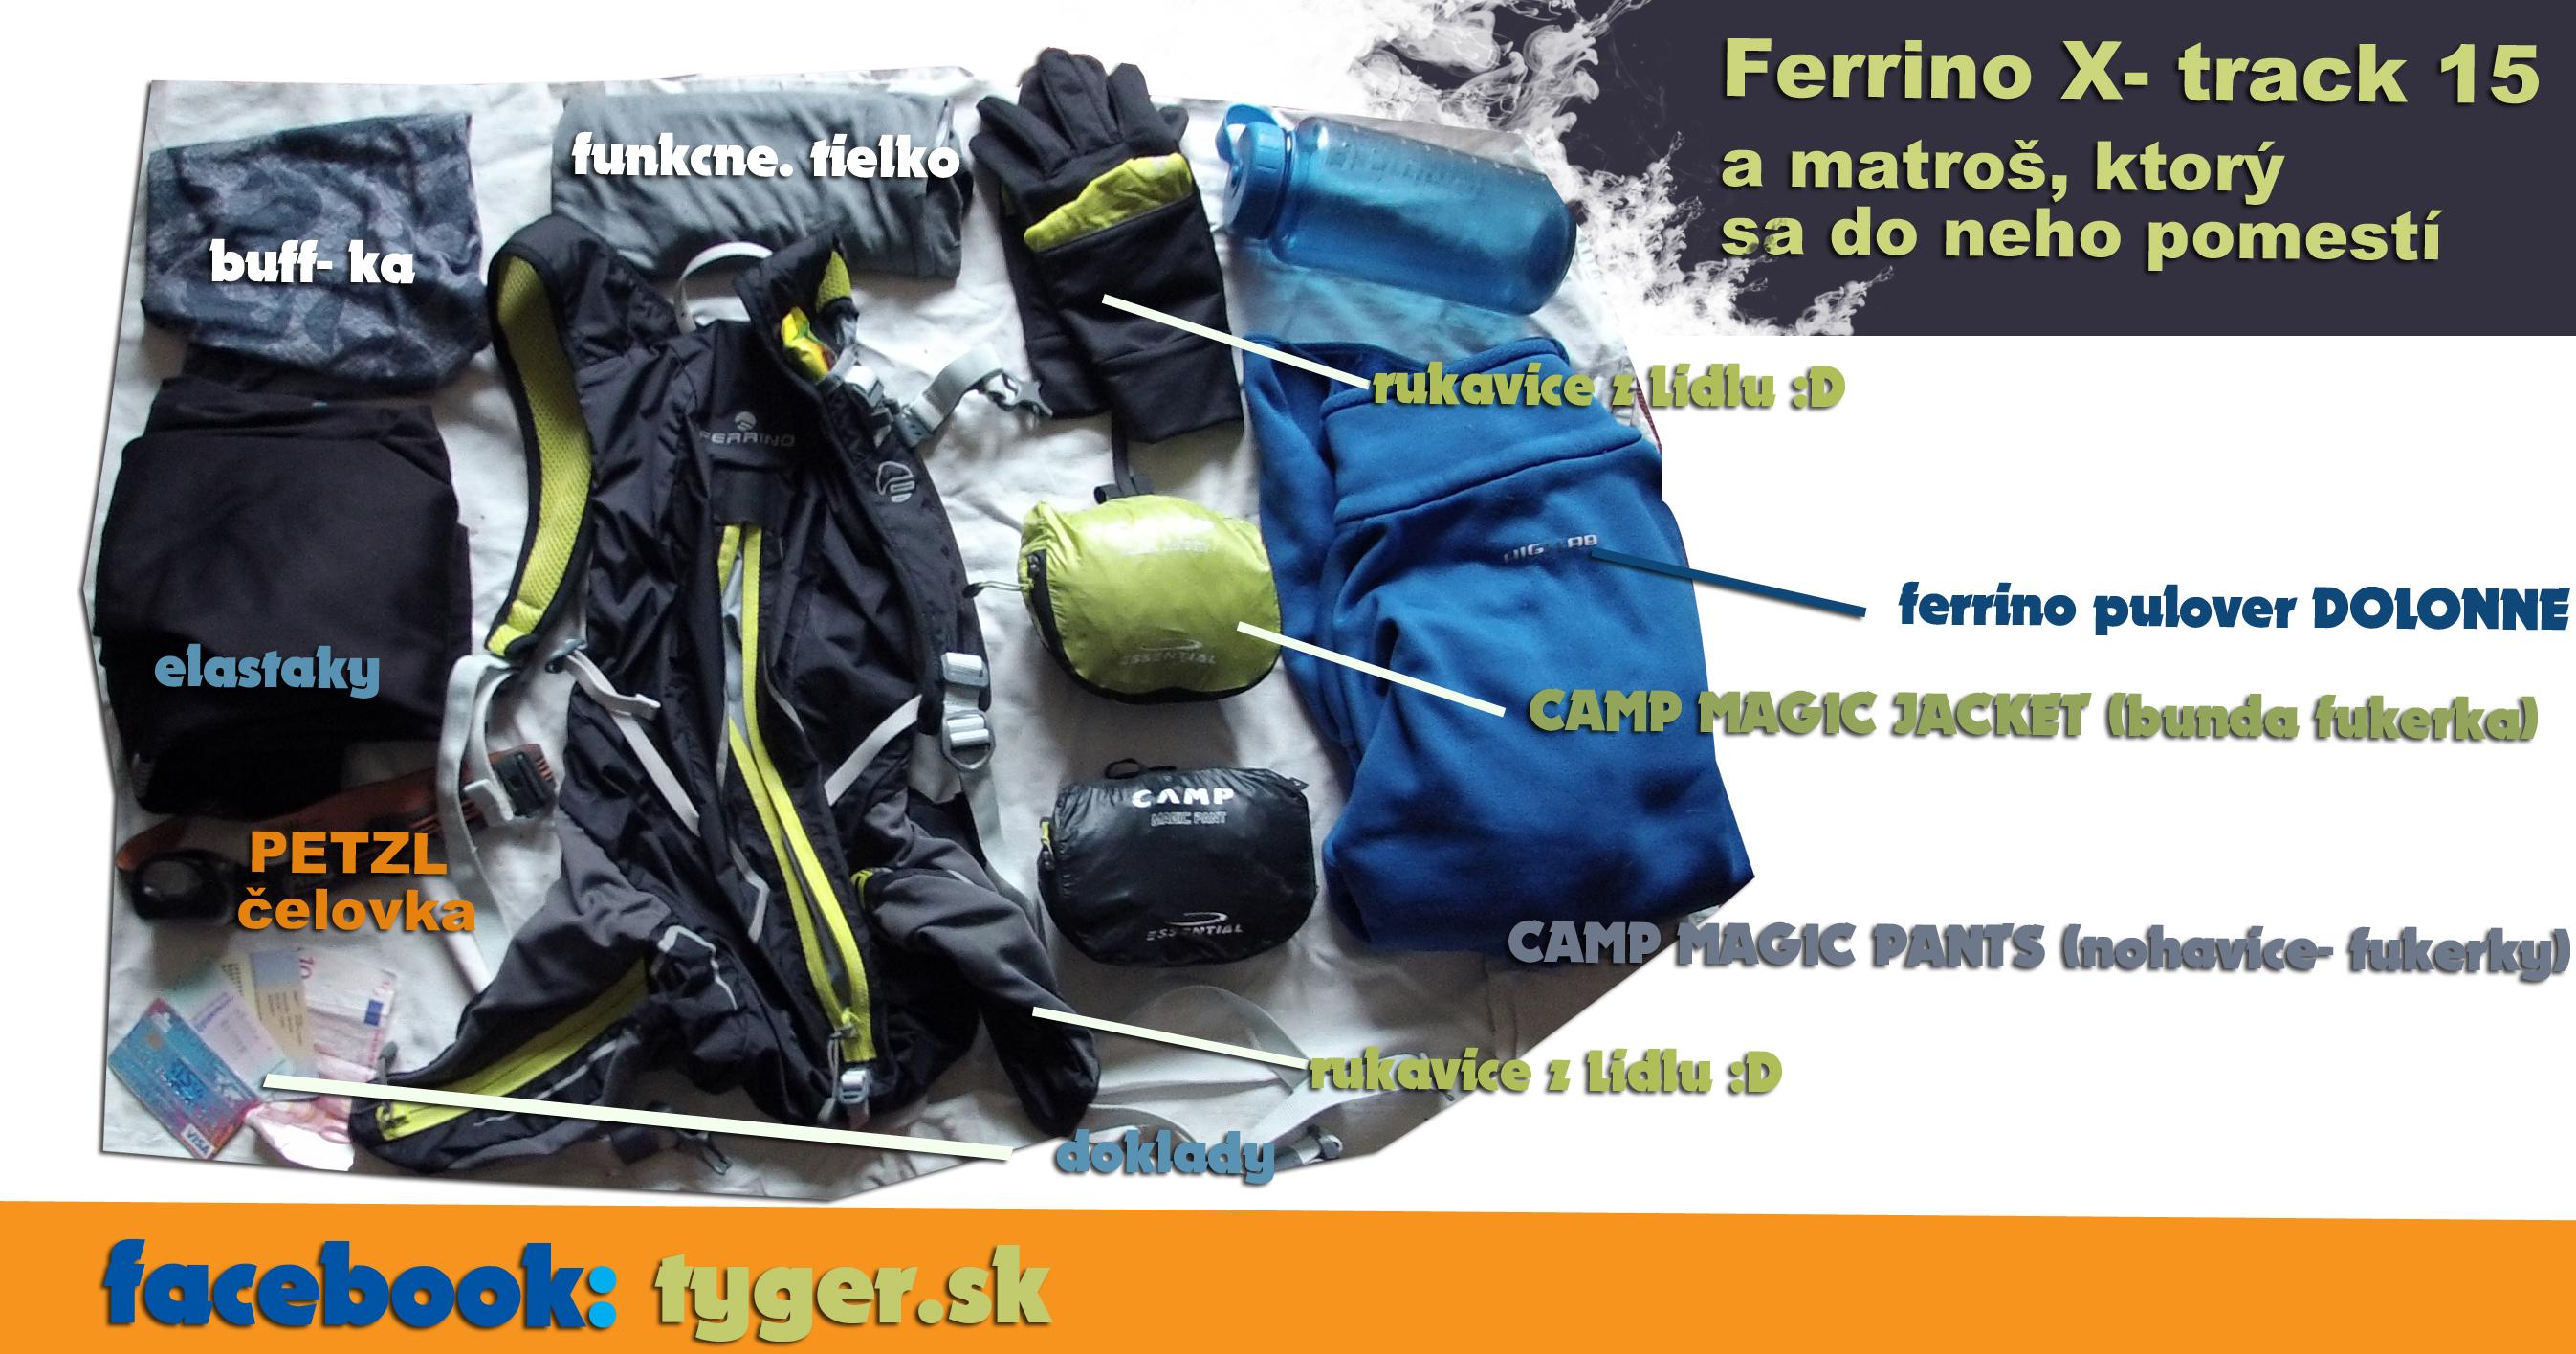 ferrino X track- 15